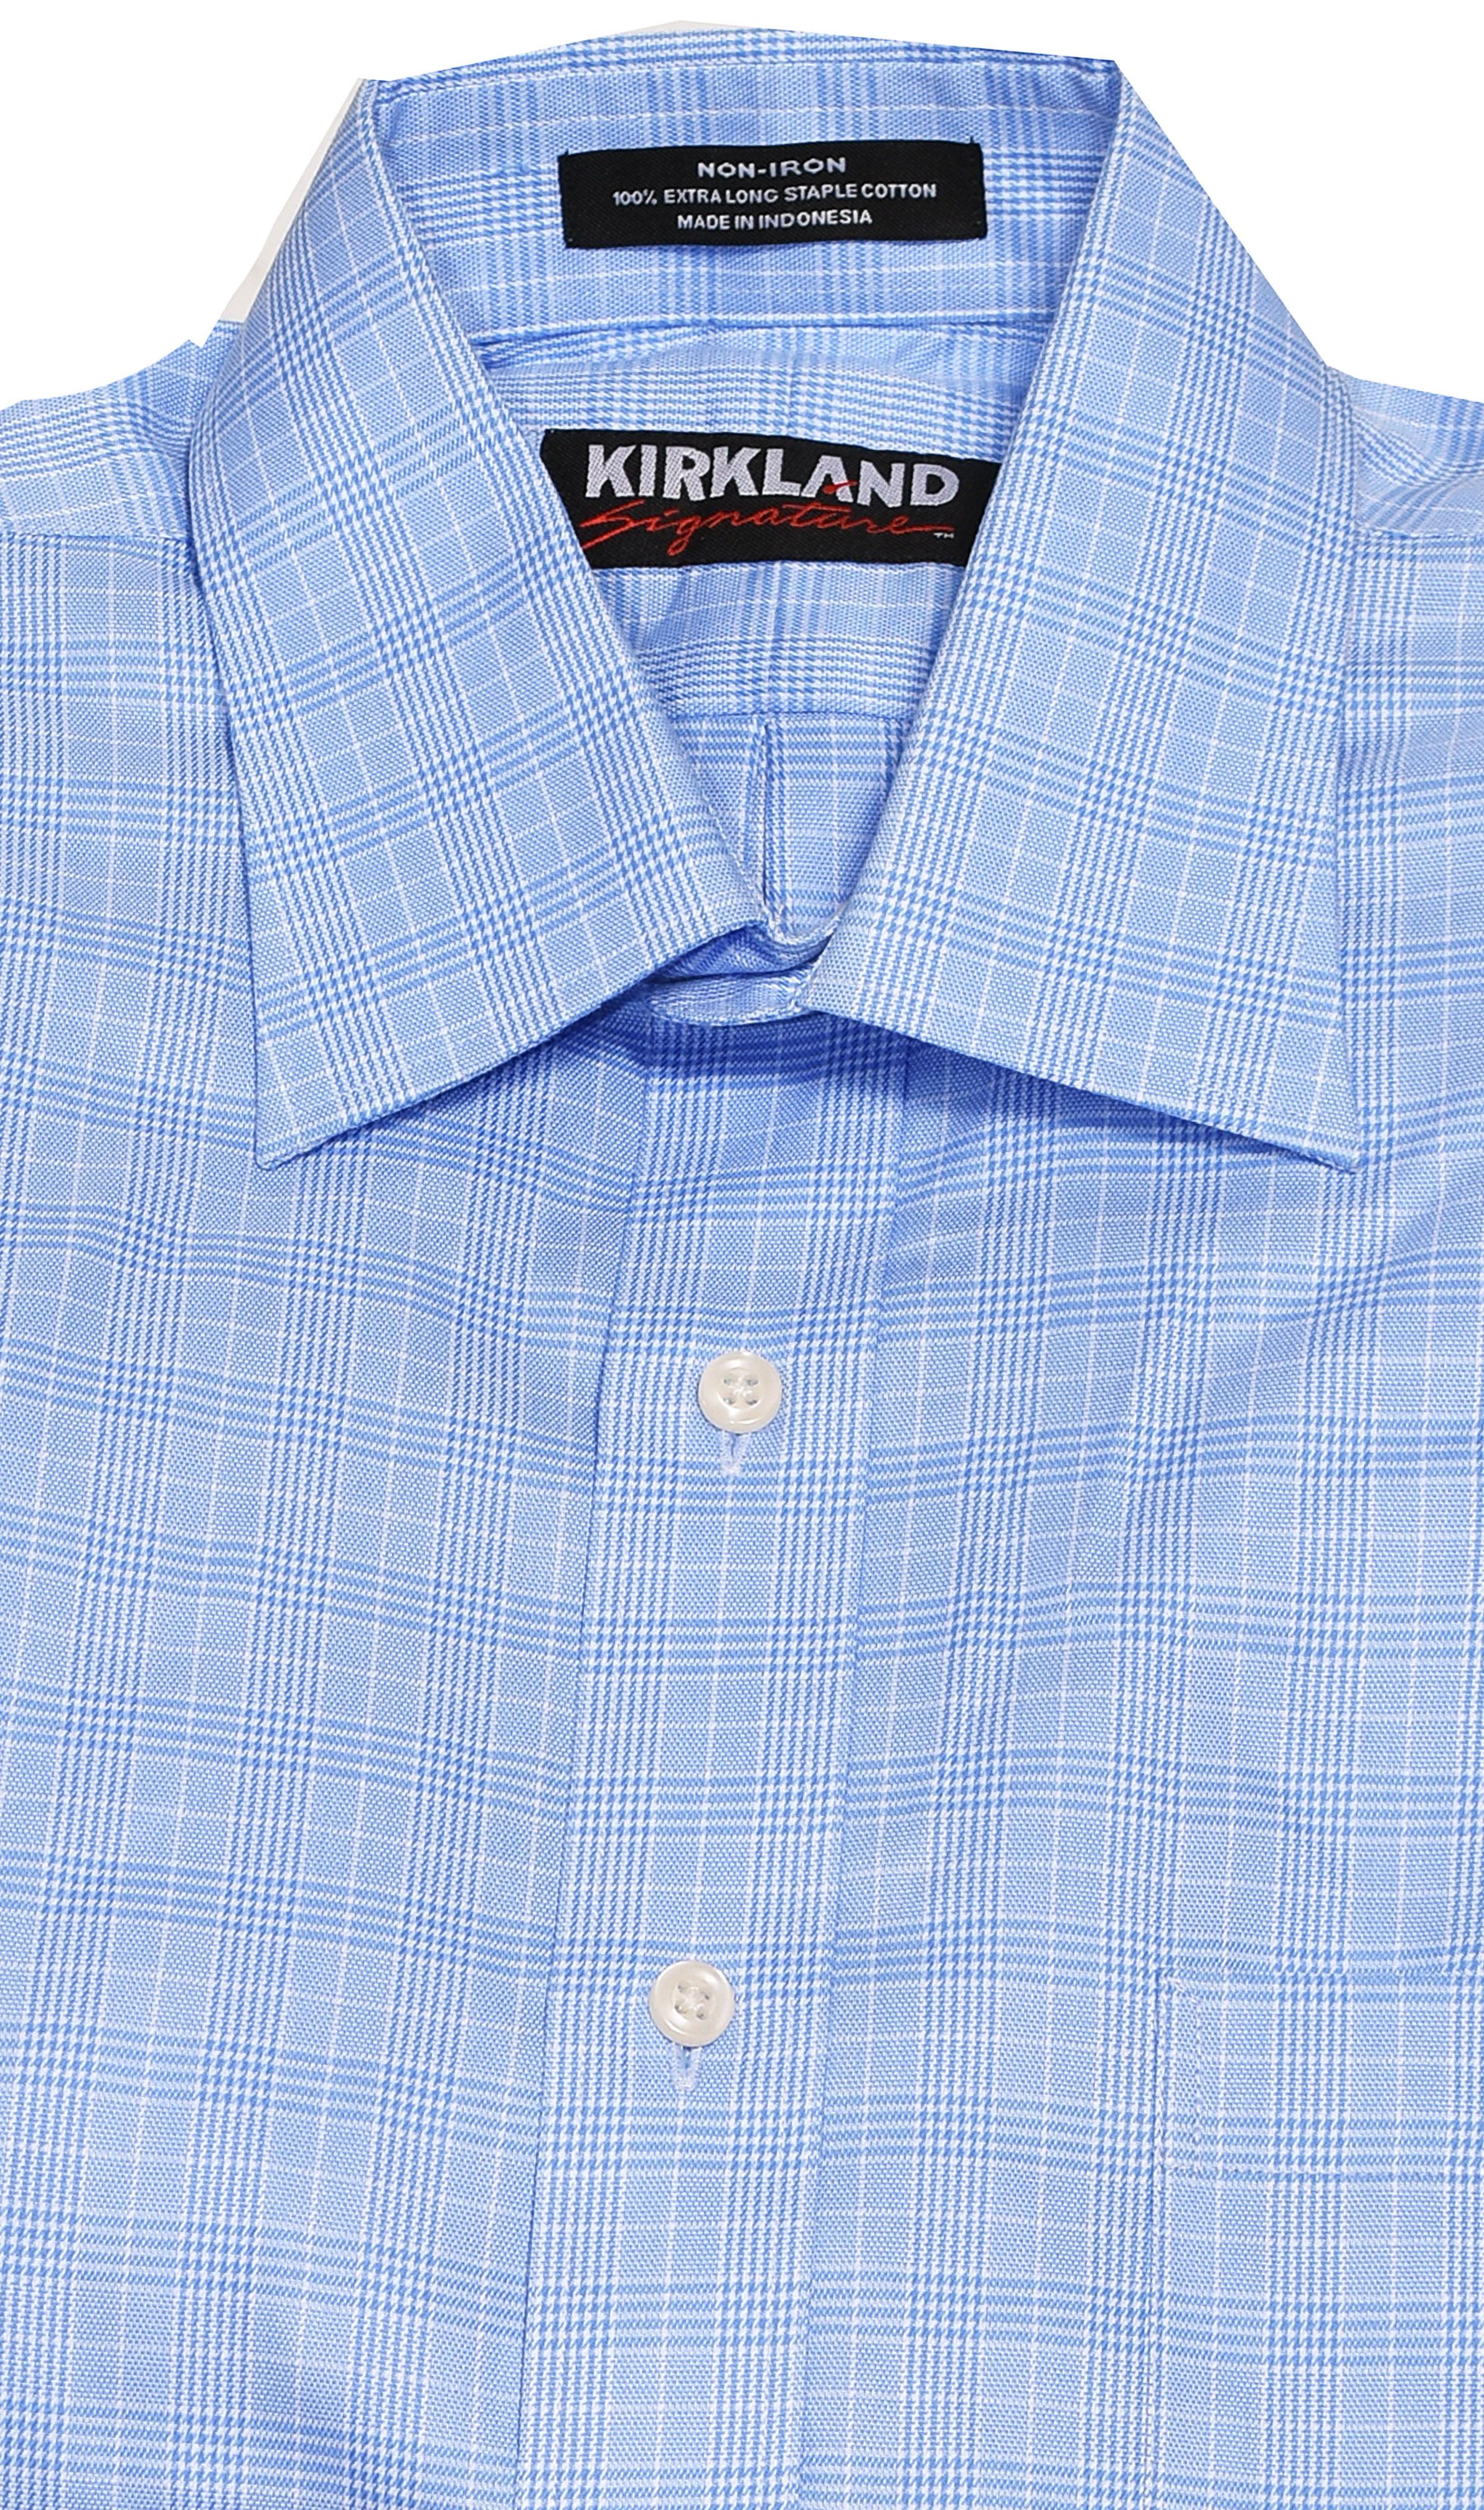 Kirkland Mens Non-Iron Stain Resistant Spread Collar Dress Shirt ...